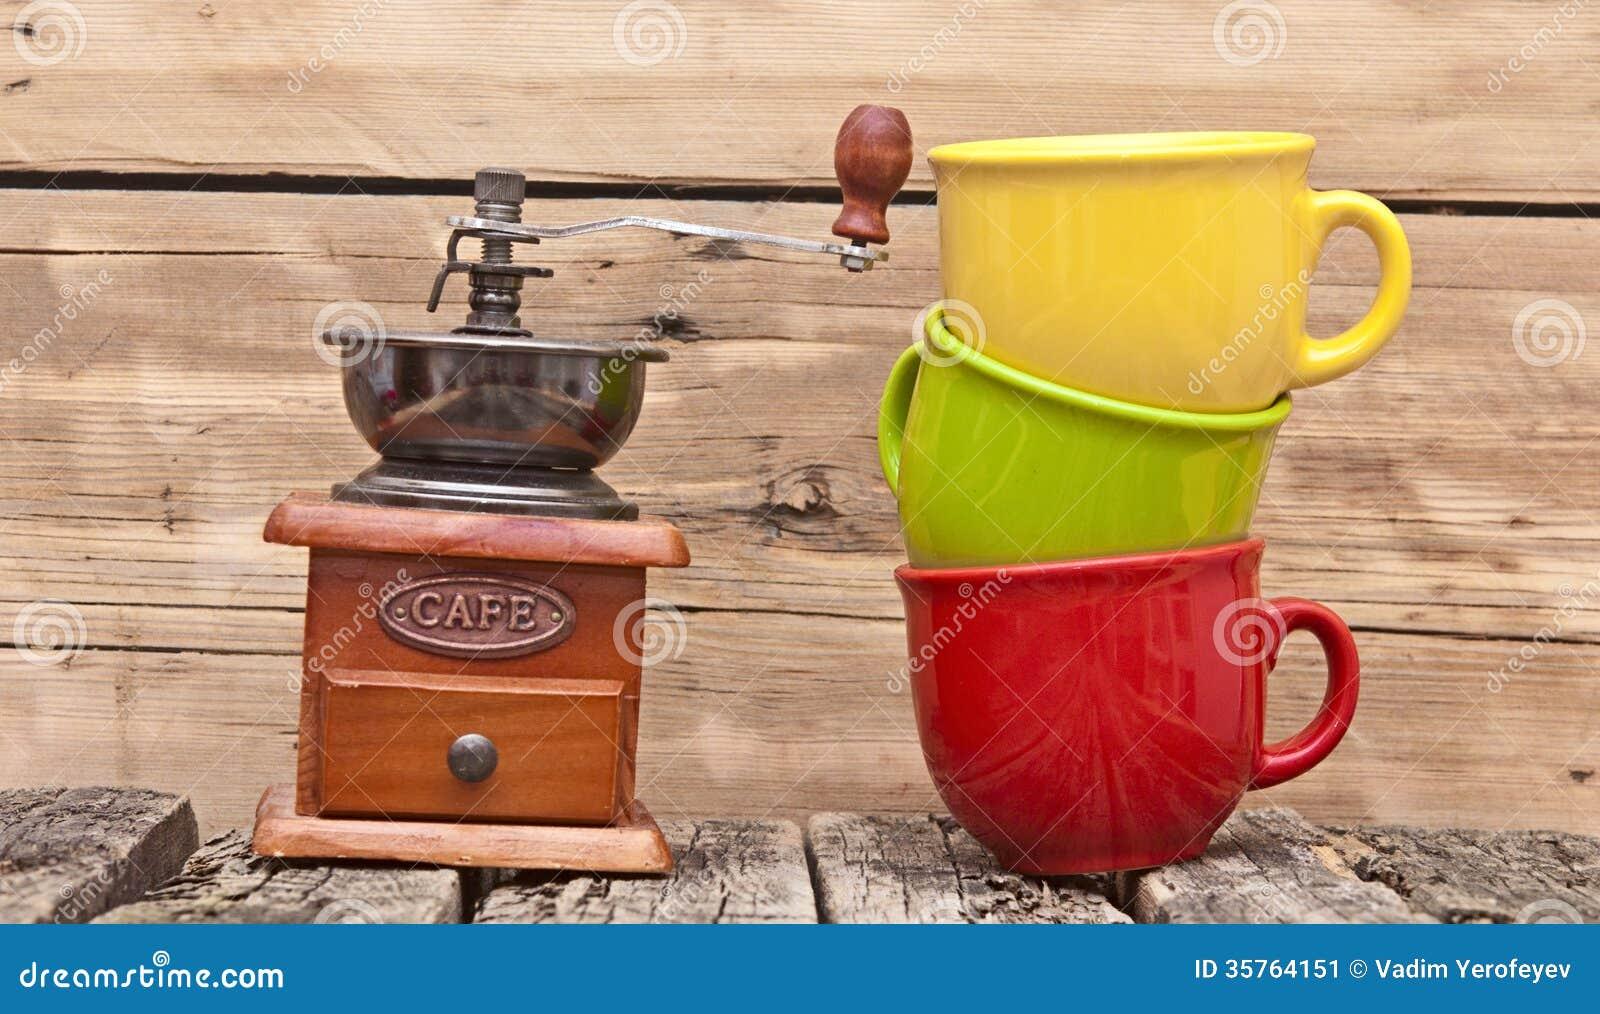 colorful coffee mugs stock image - Colorful Mugs